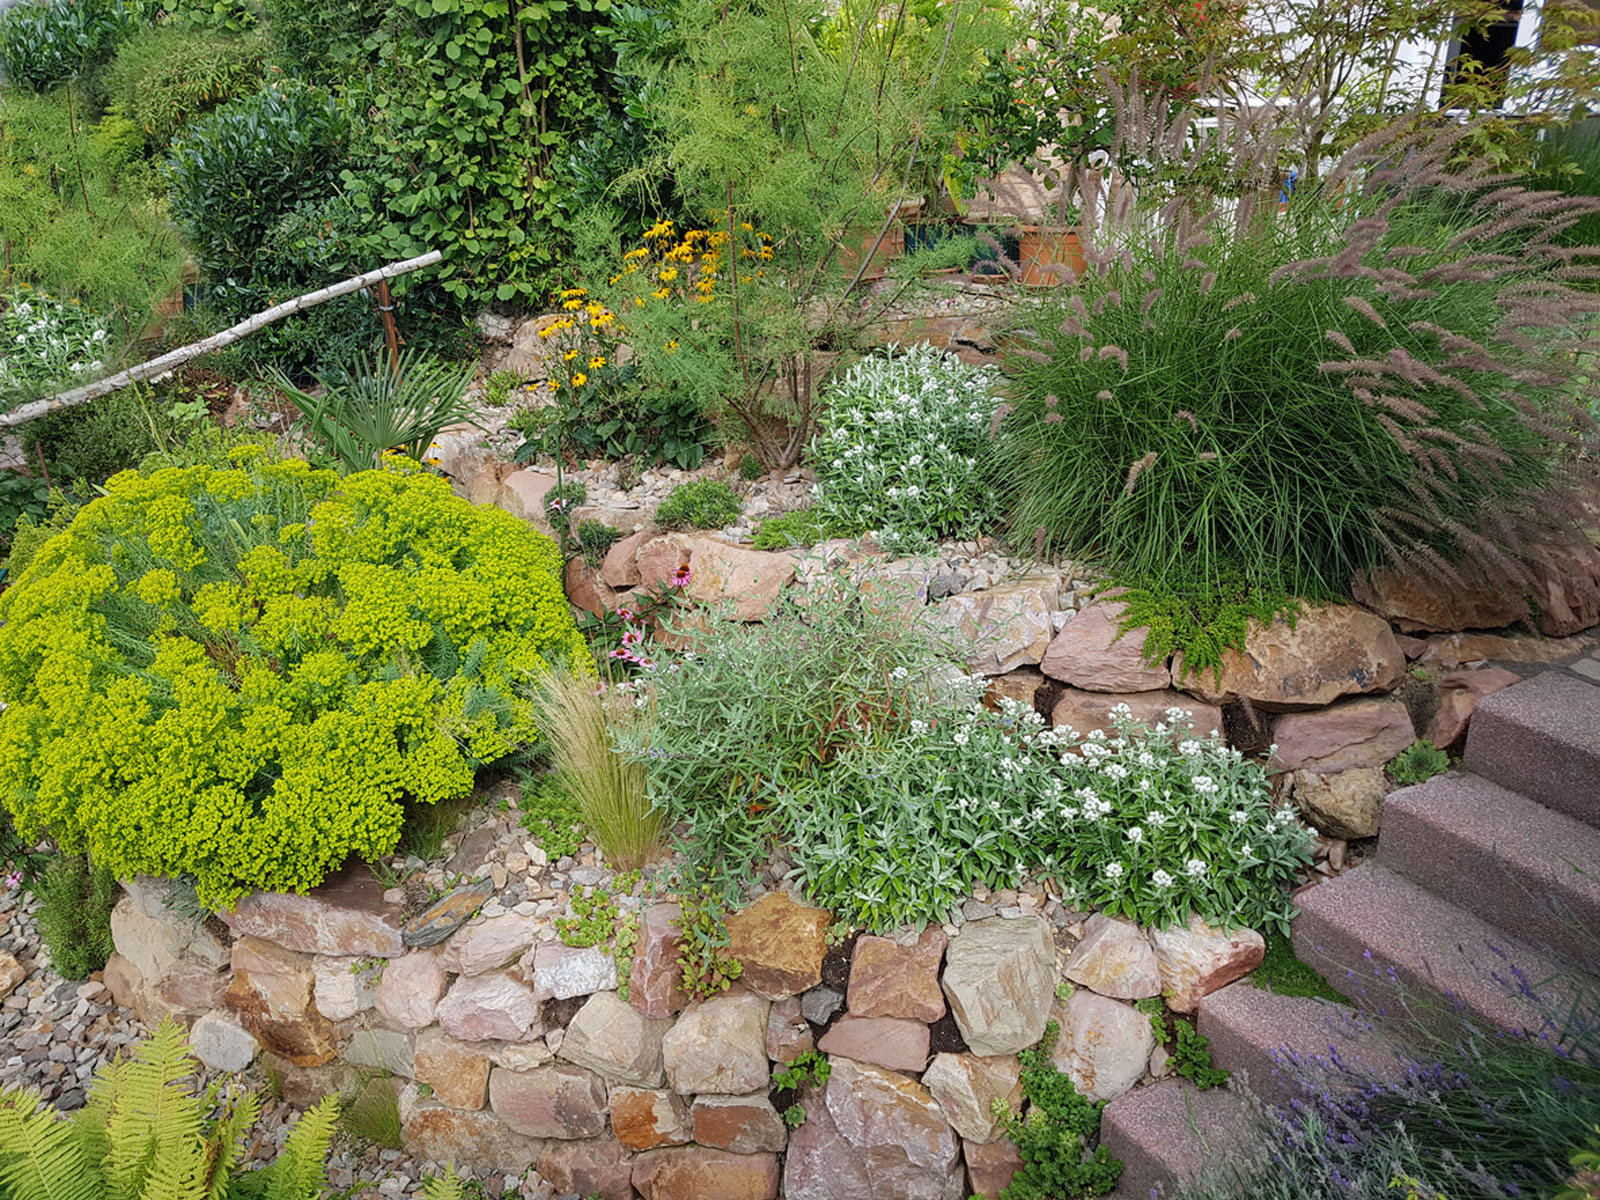 Sloped Rock Garden Design – Tips On Creating A Hillside Rock Garden